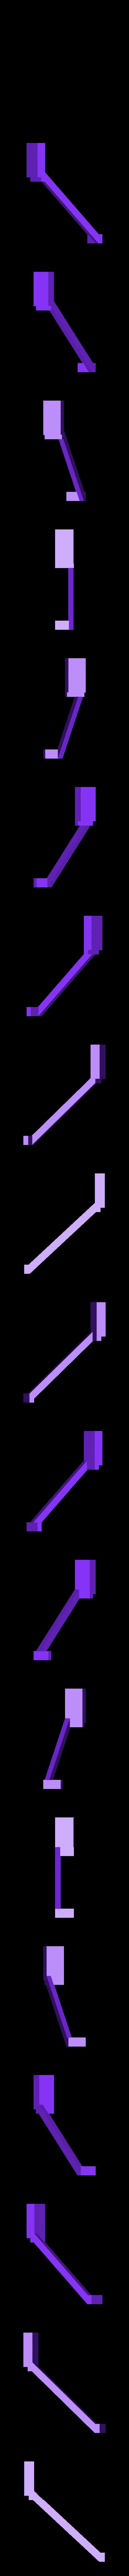 Ladder_Brace.STL Download free STL file 4-8-8-4 Big Boy Locomotive • 3D printer object, RaymondDeLuca